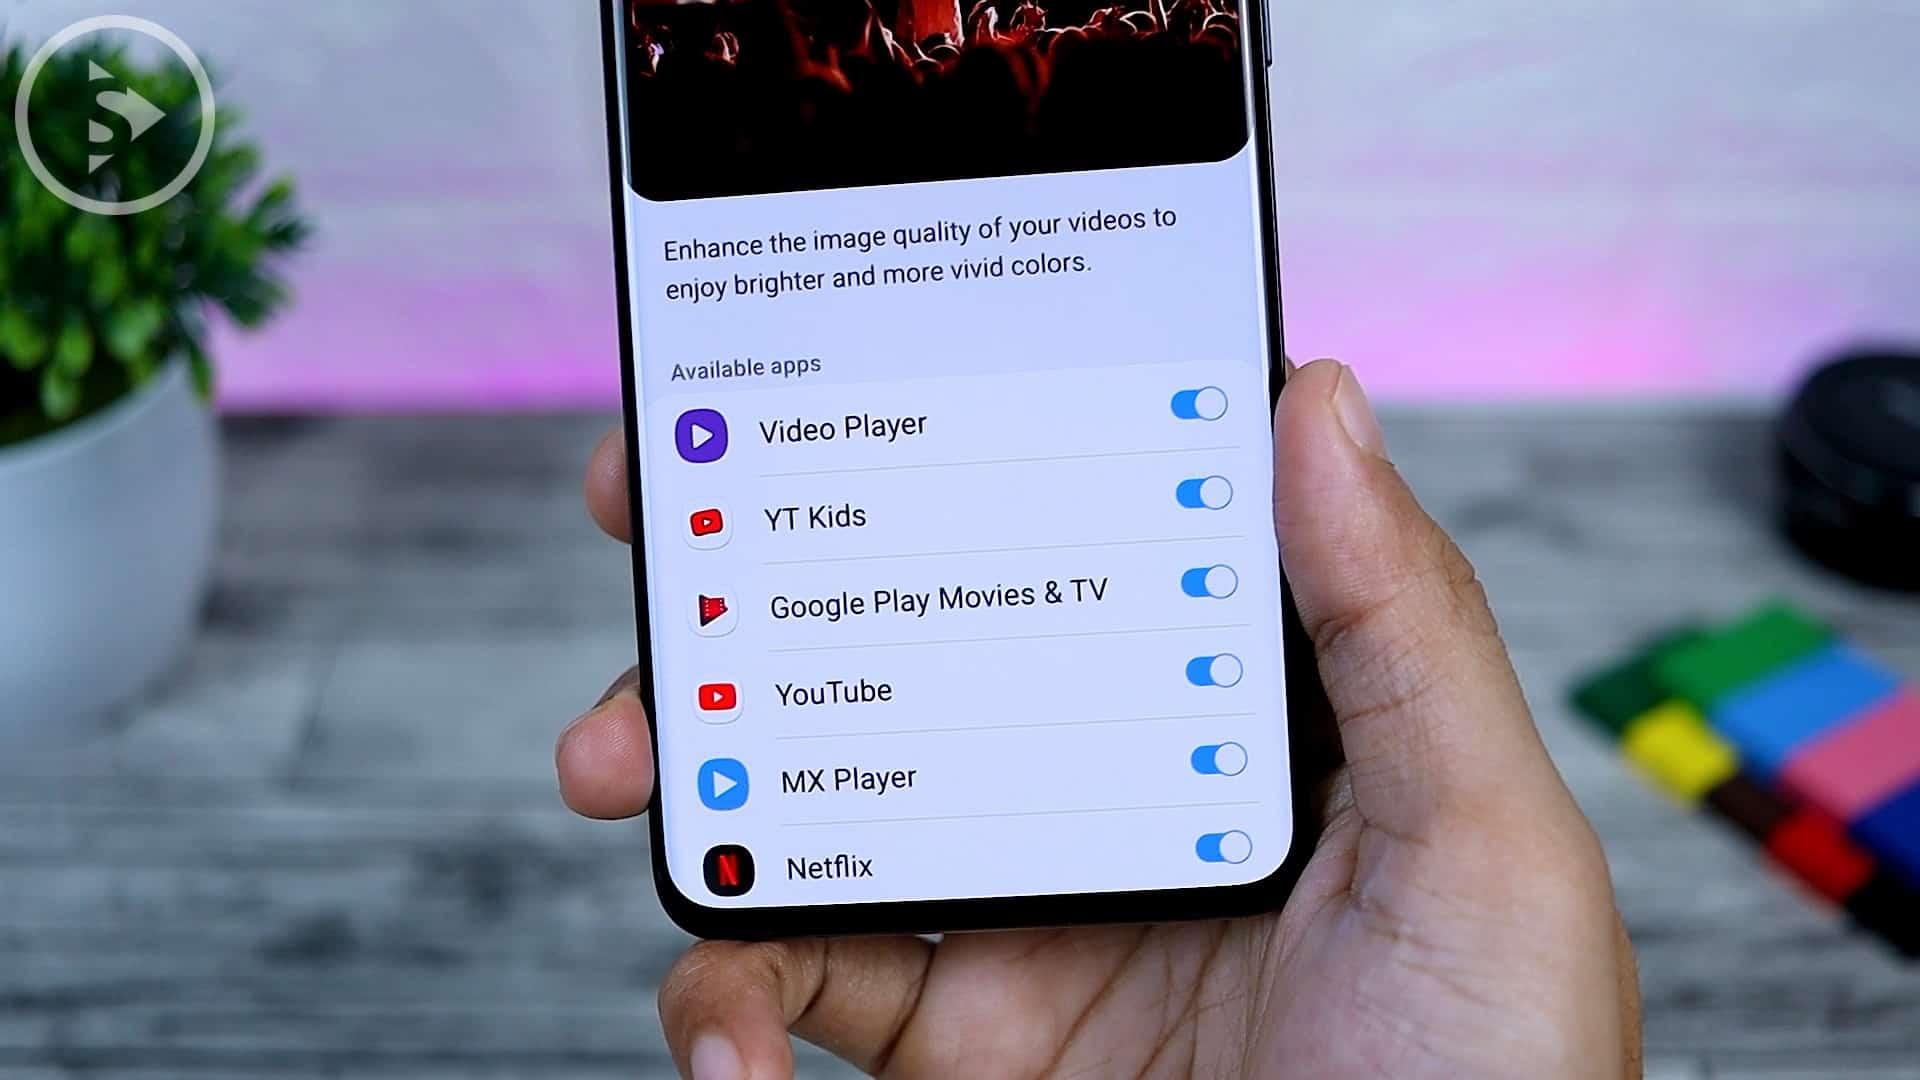 25 Fitur Baru di One UI 3.0 Dengan Android 11 - Video Enhancer on Certain App Only